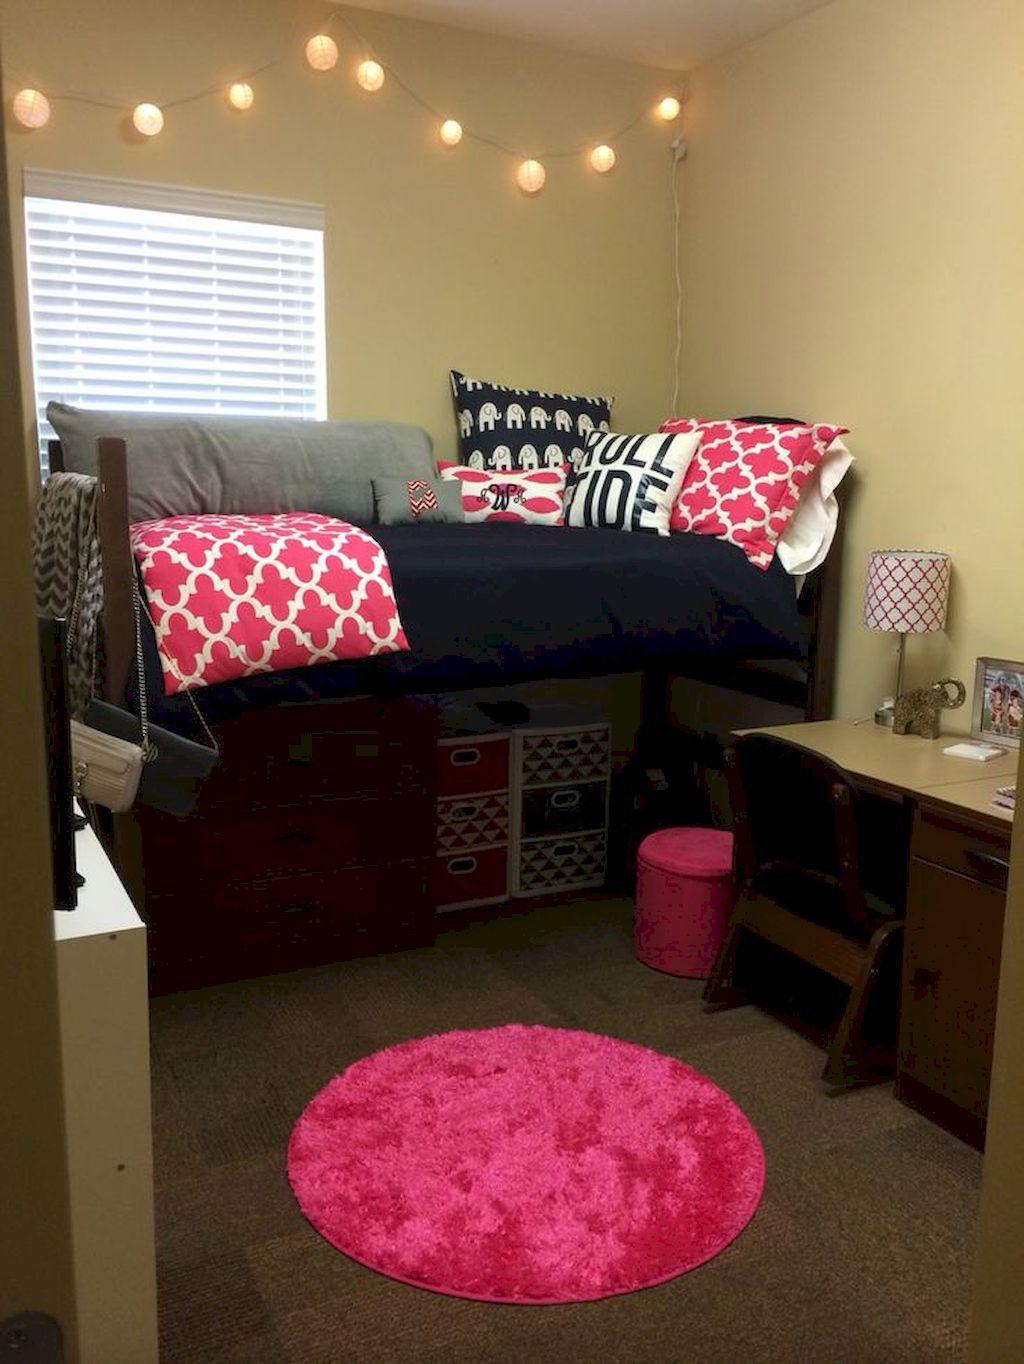 Live Laugh Puke Dorm Room Ideas